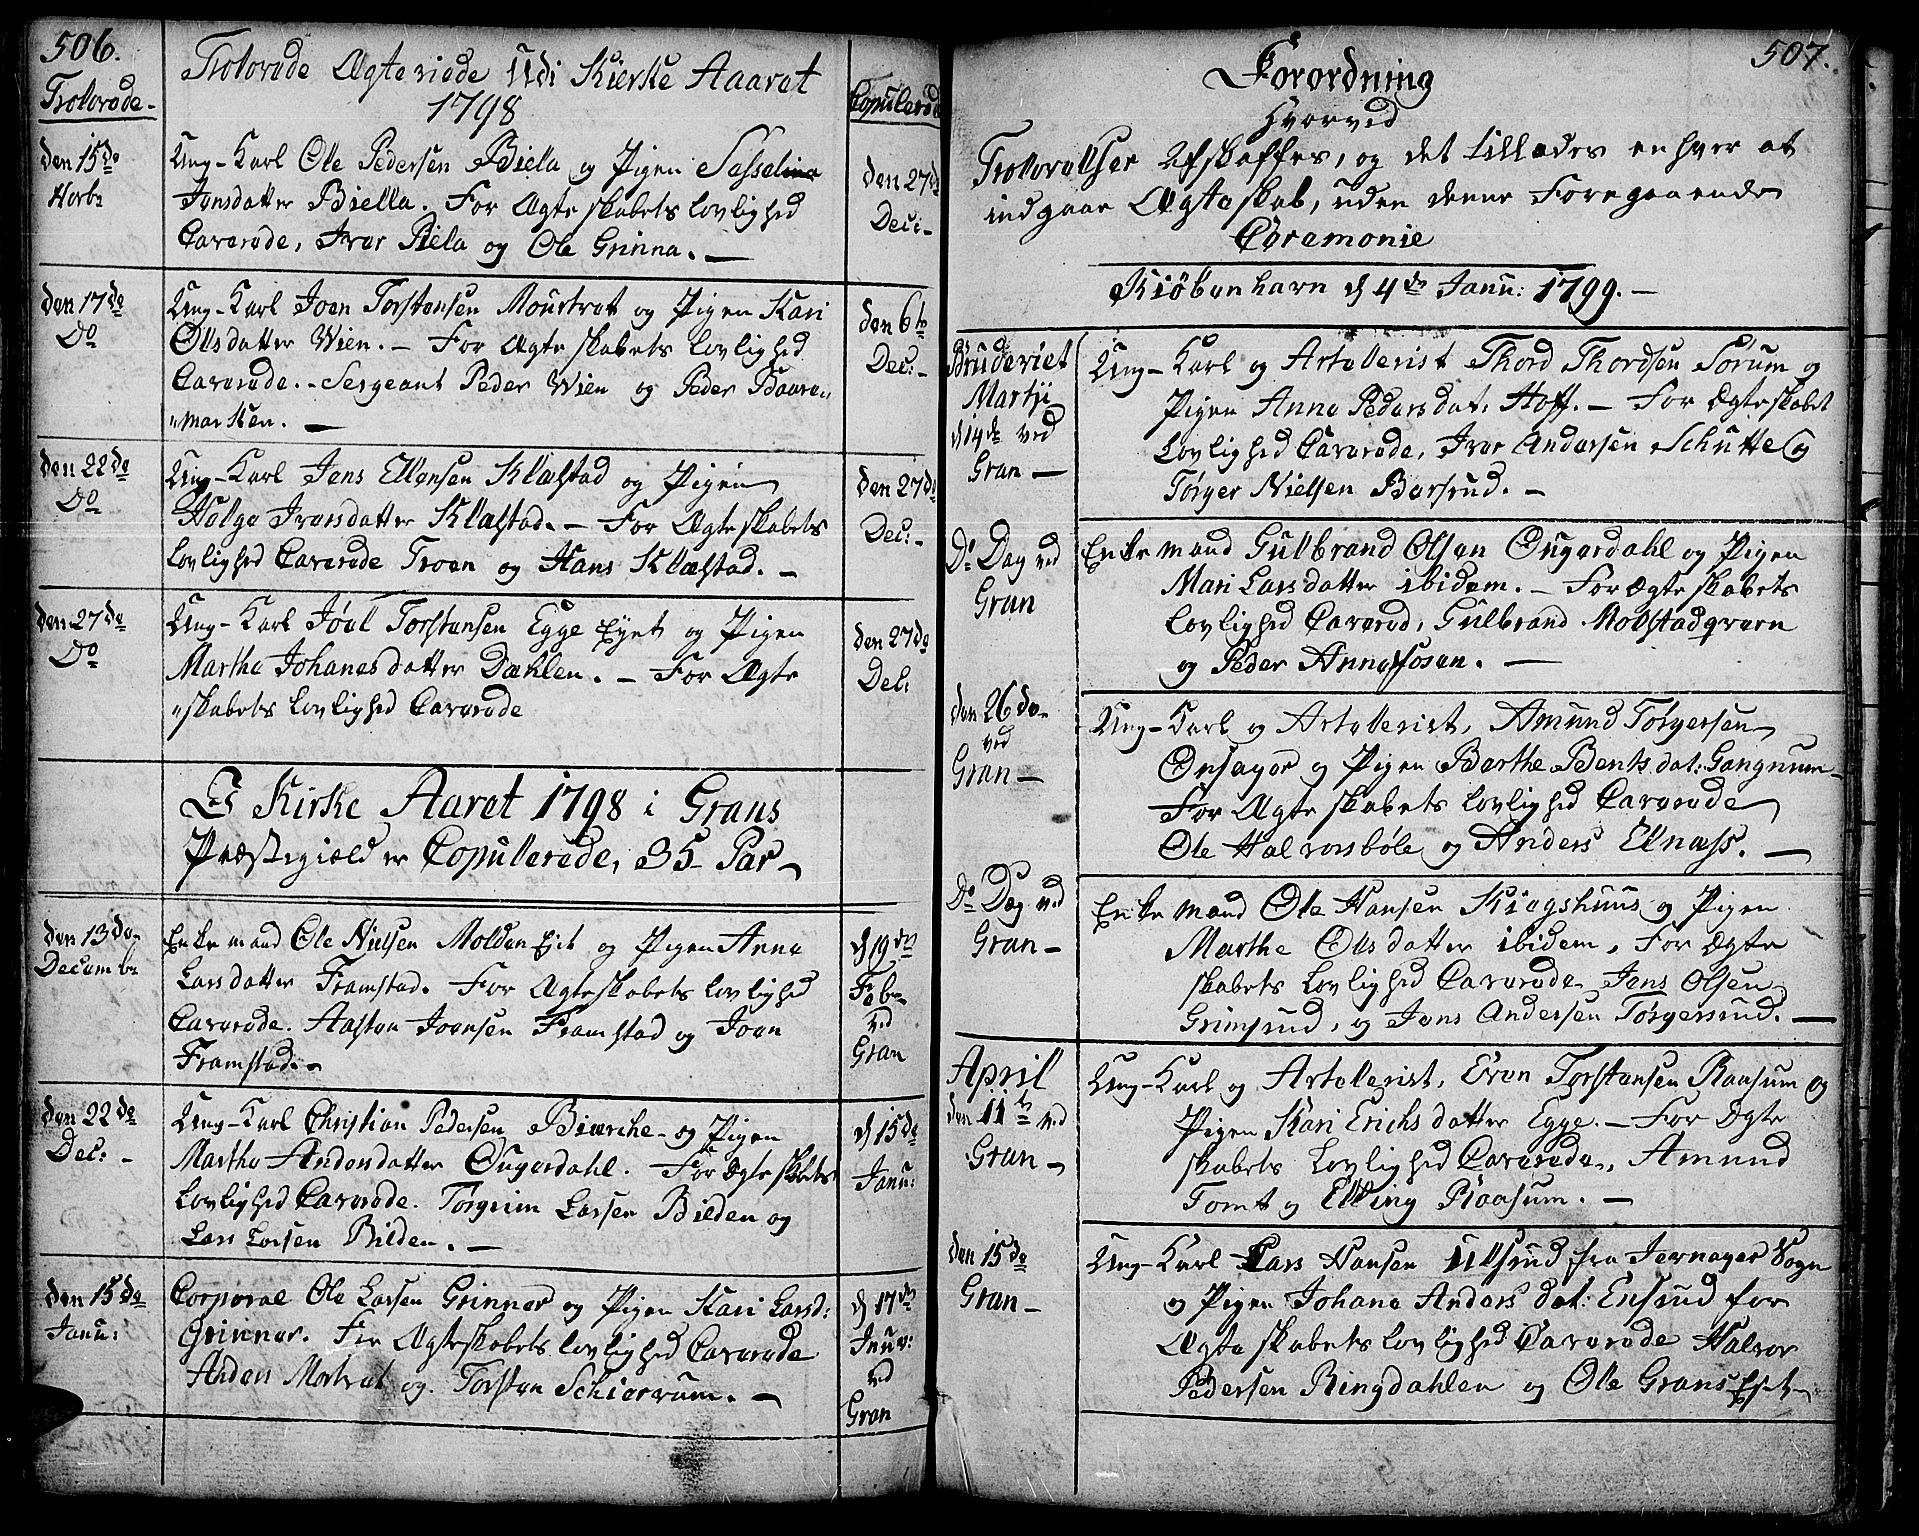 SAH, Gran prestekontor, Ministerialbok nr. 6, 1787-1824, s. 506-507